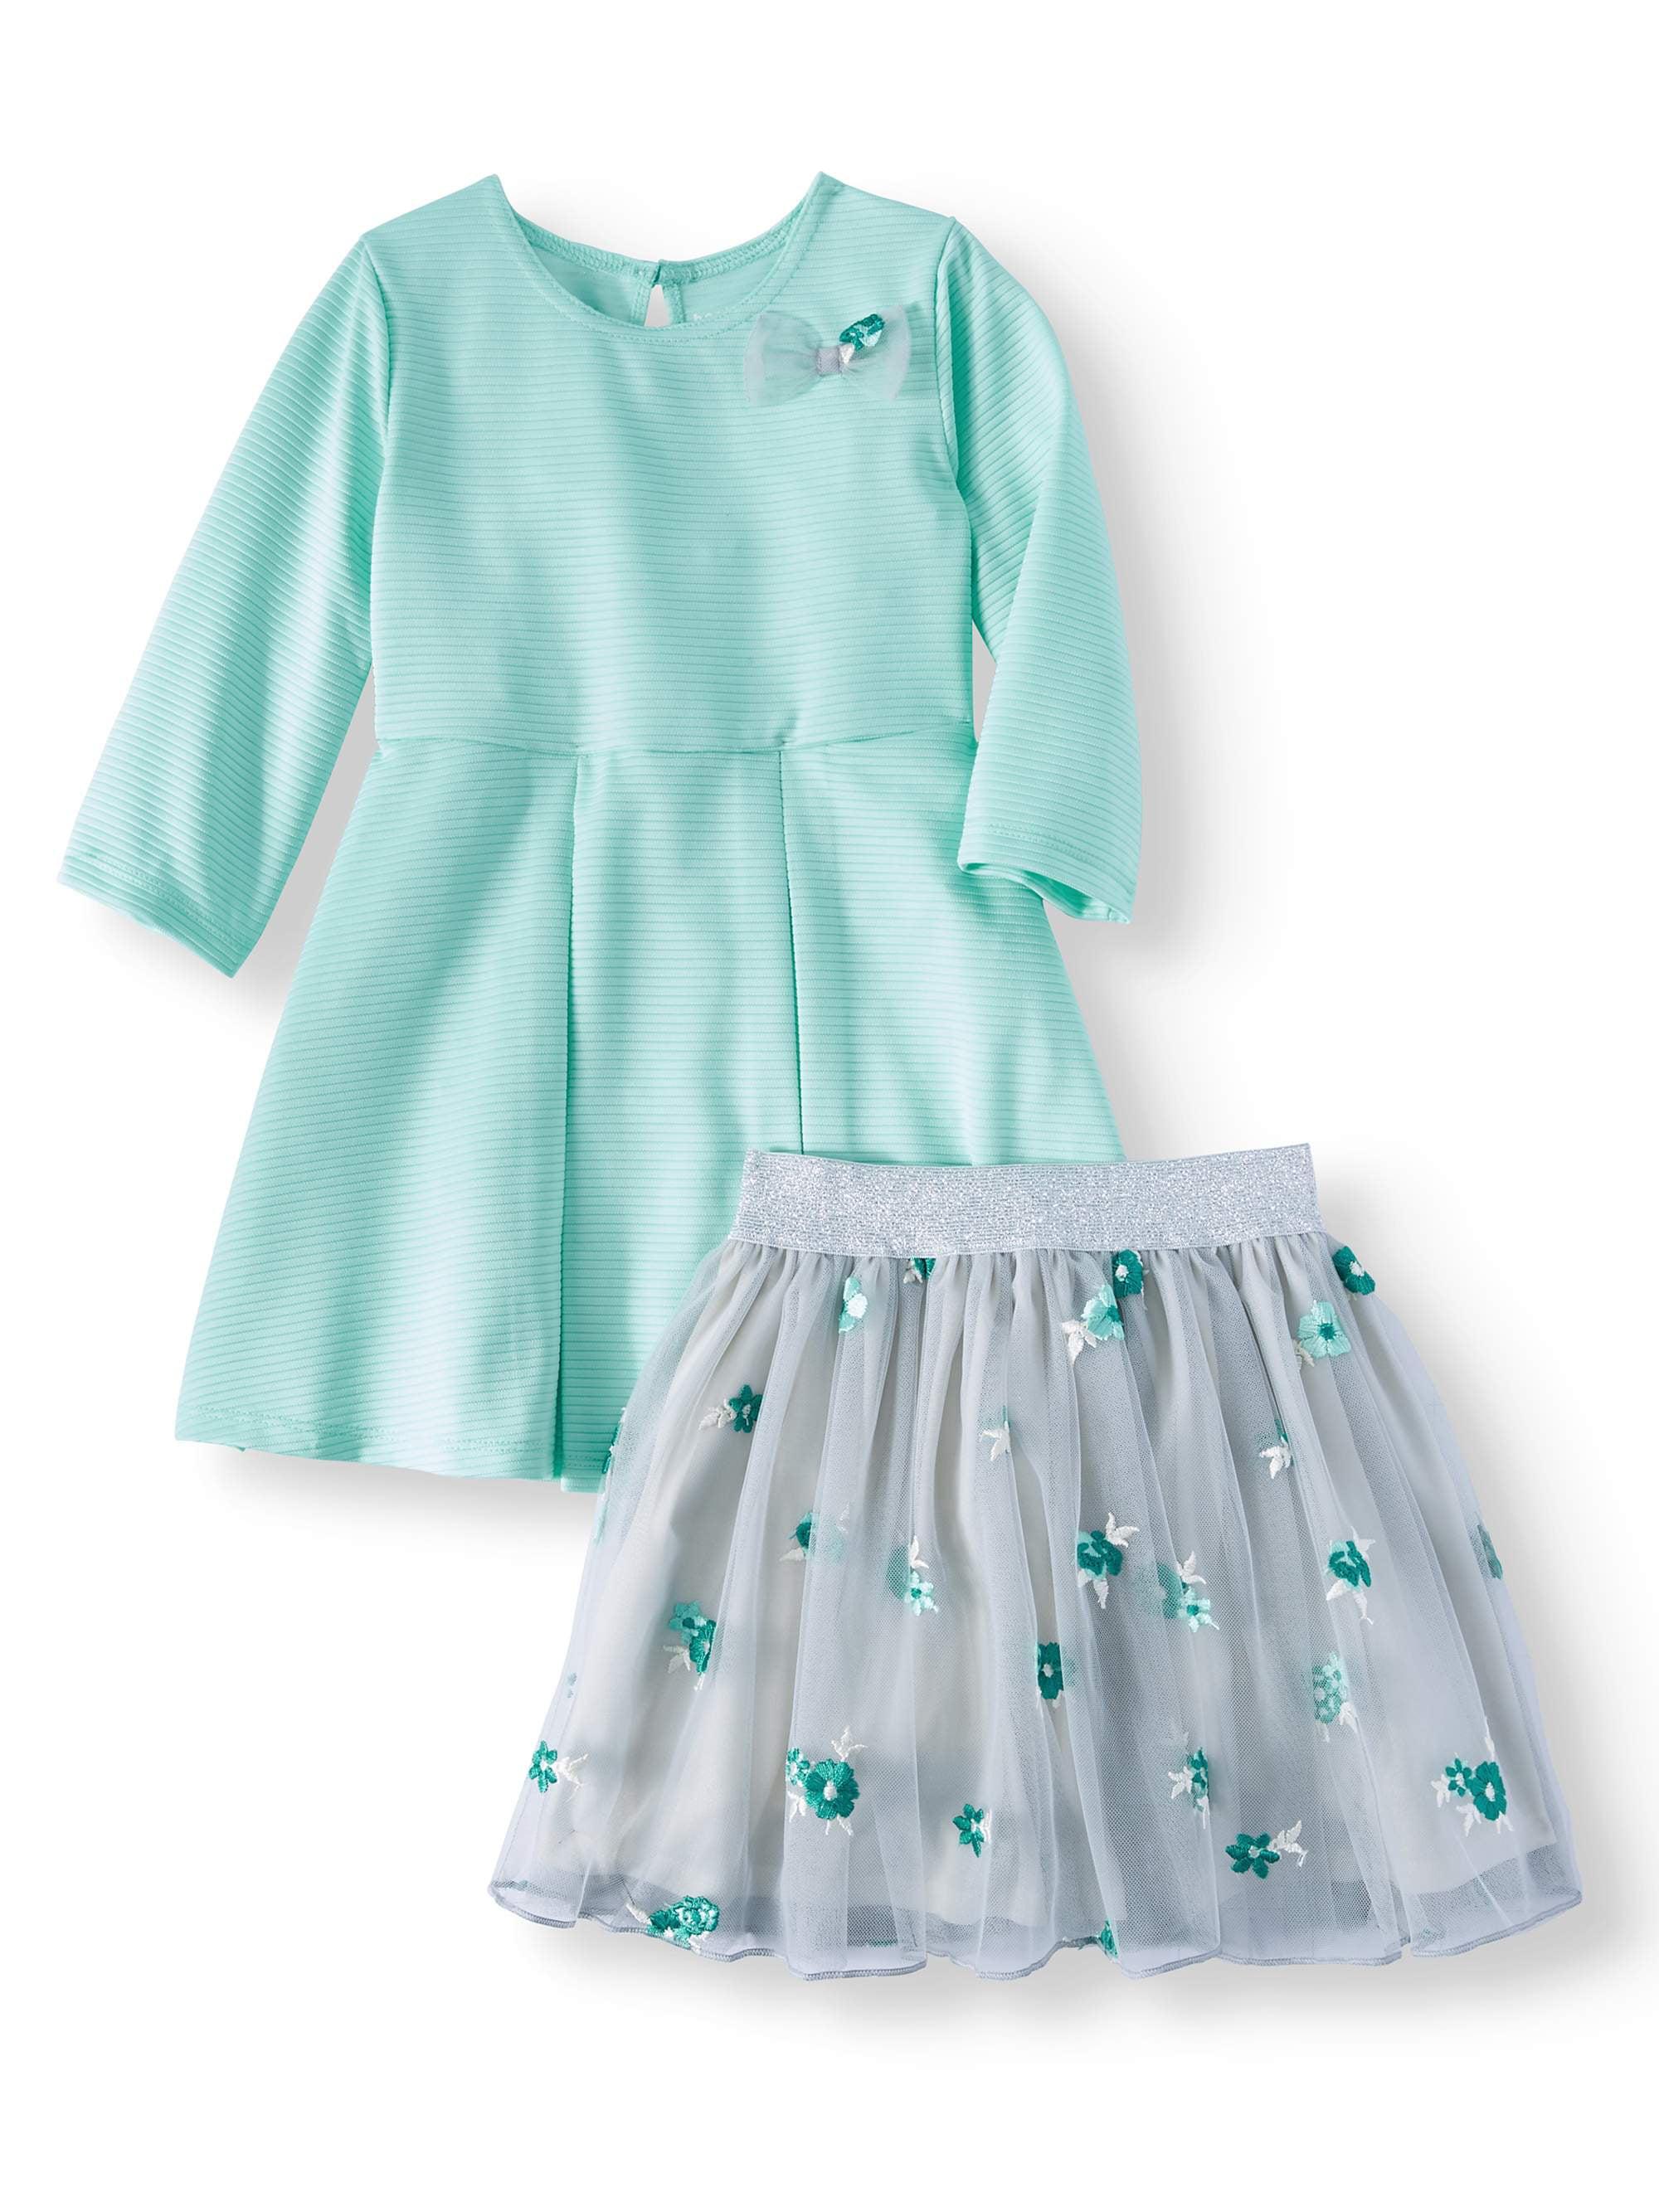 Interchangeable 2-in-1 Tutu Dress, 2-Piece Set (Toddler Girls)